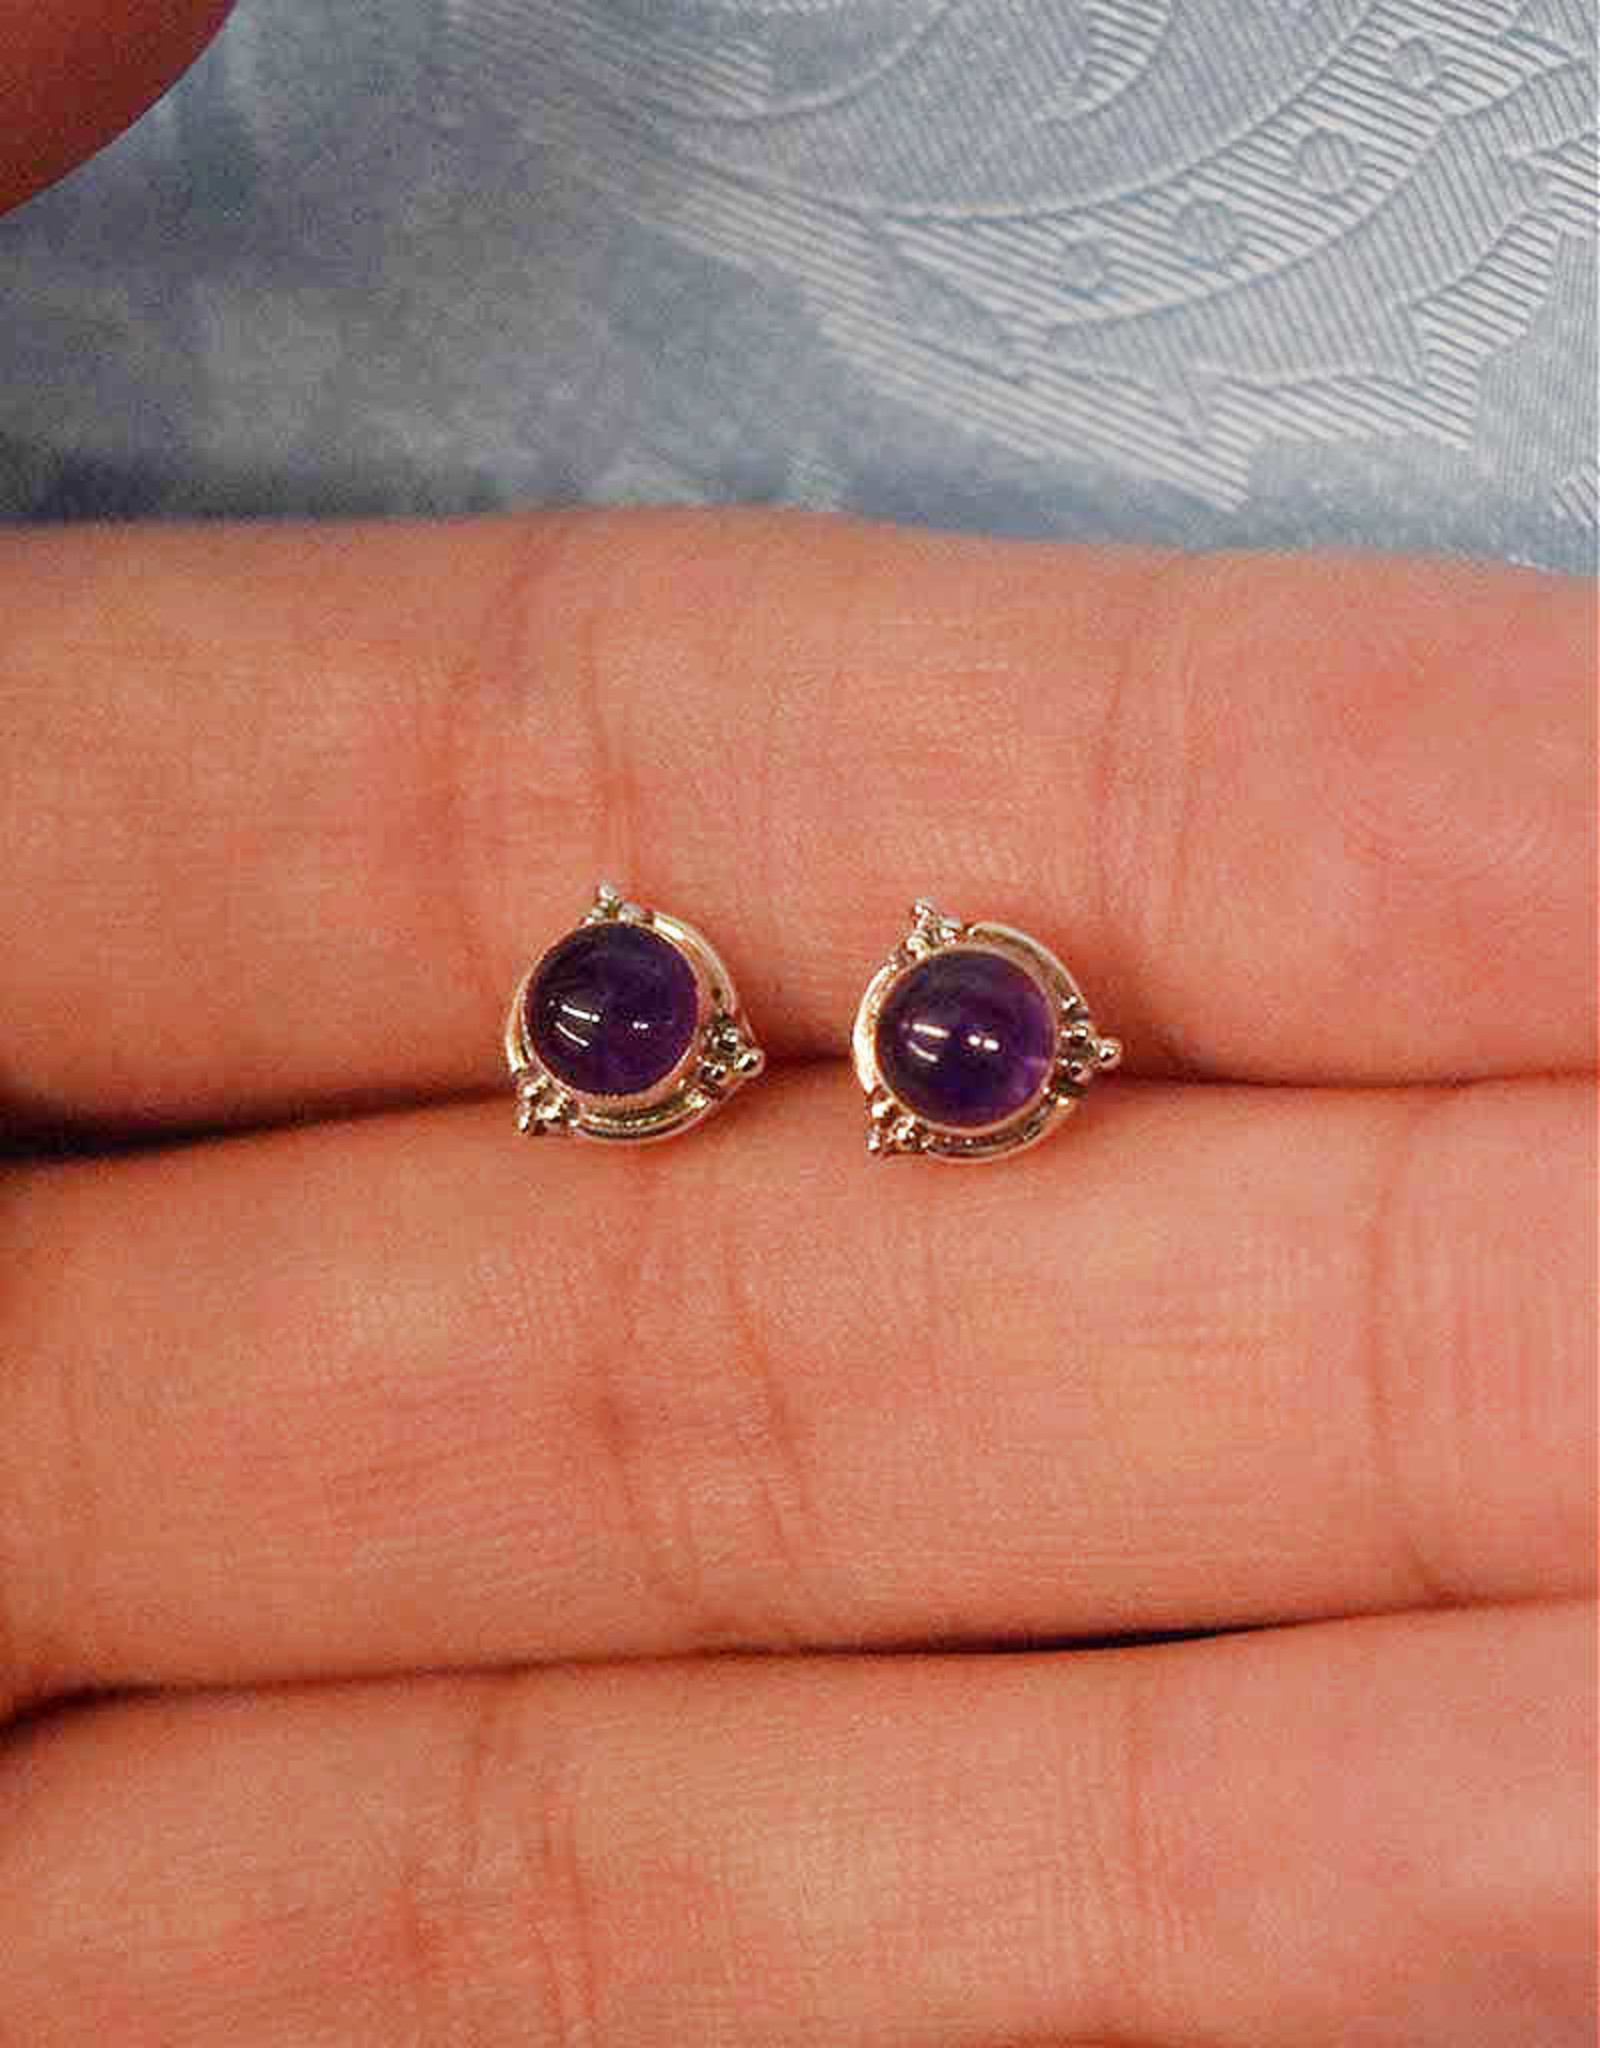 Amethyst Round B Sterling Silver Stud Earrings